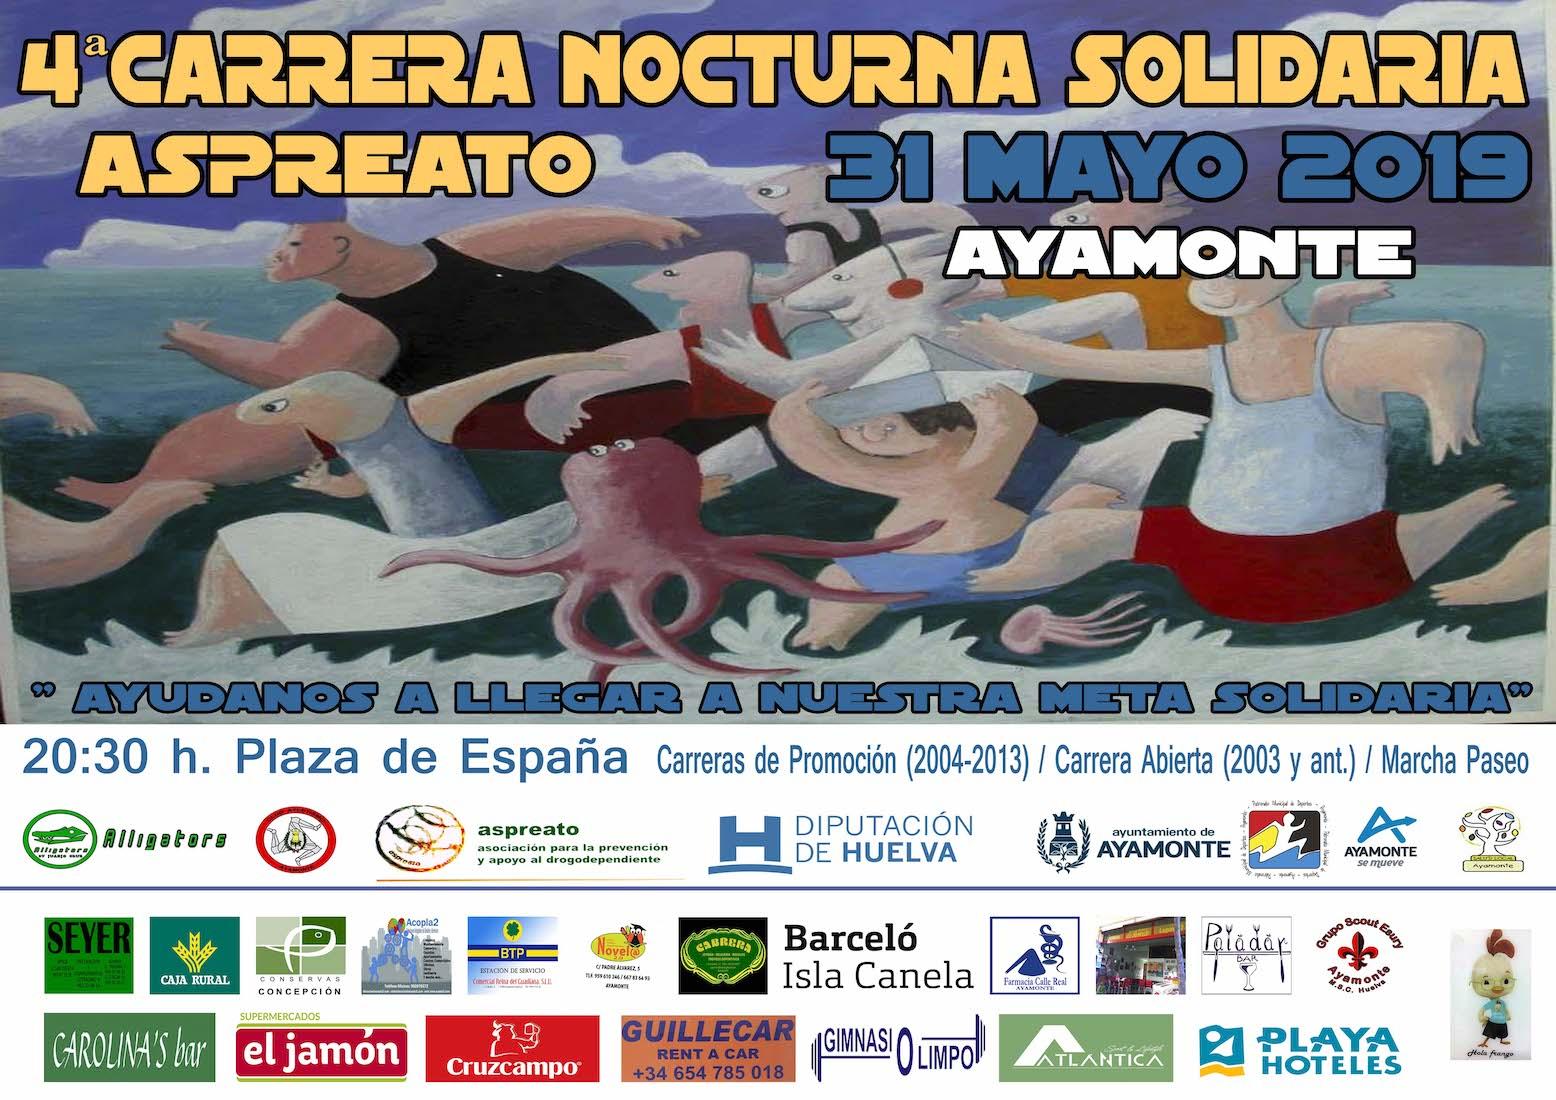 4 Carrera nocturna solidaria Aspreato Ayamonte